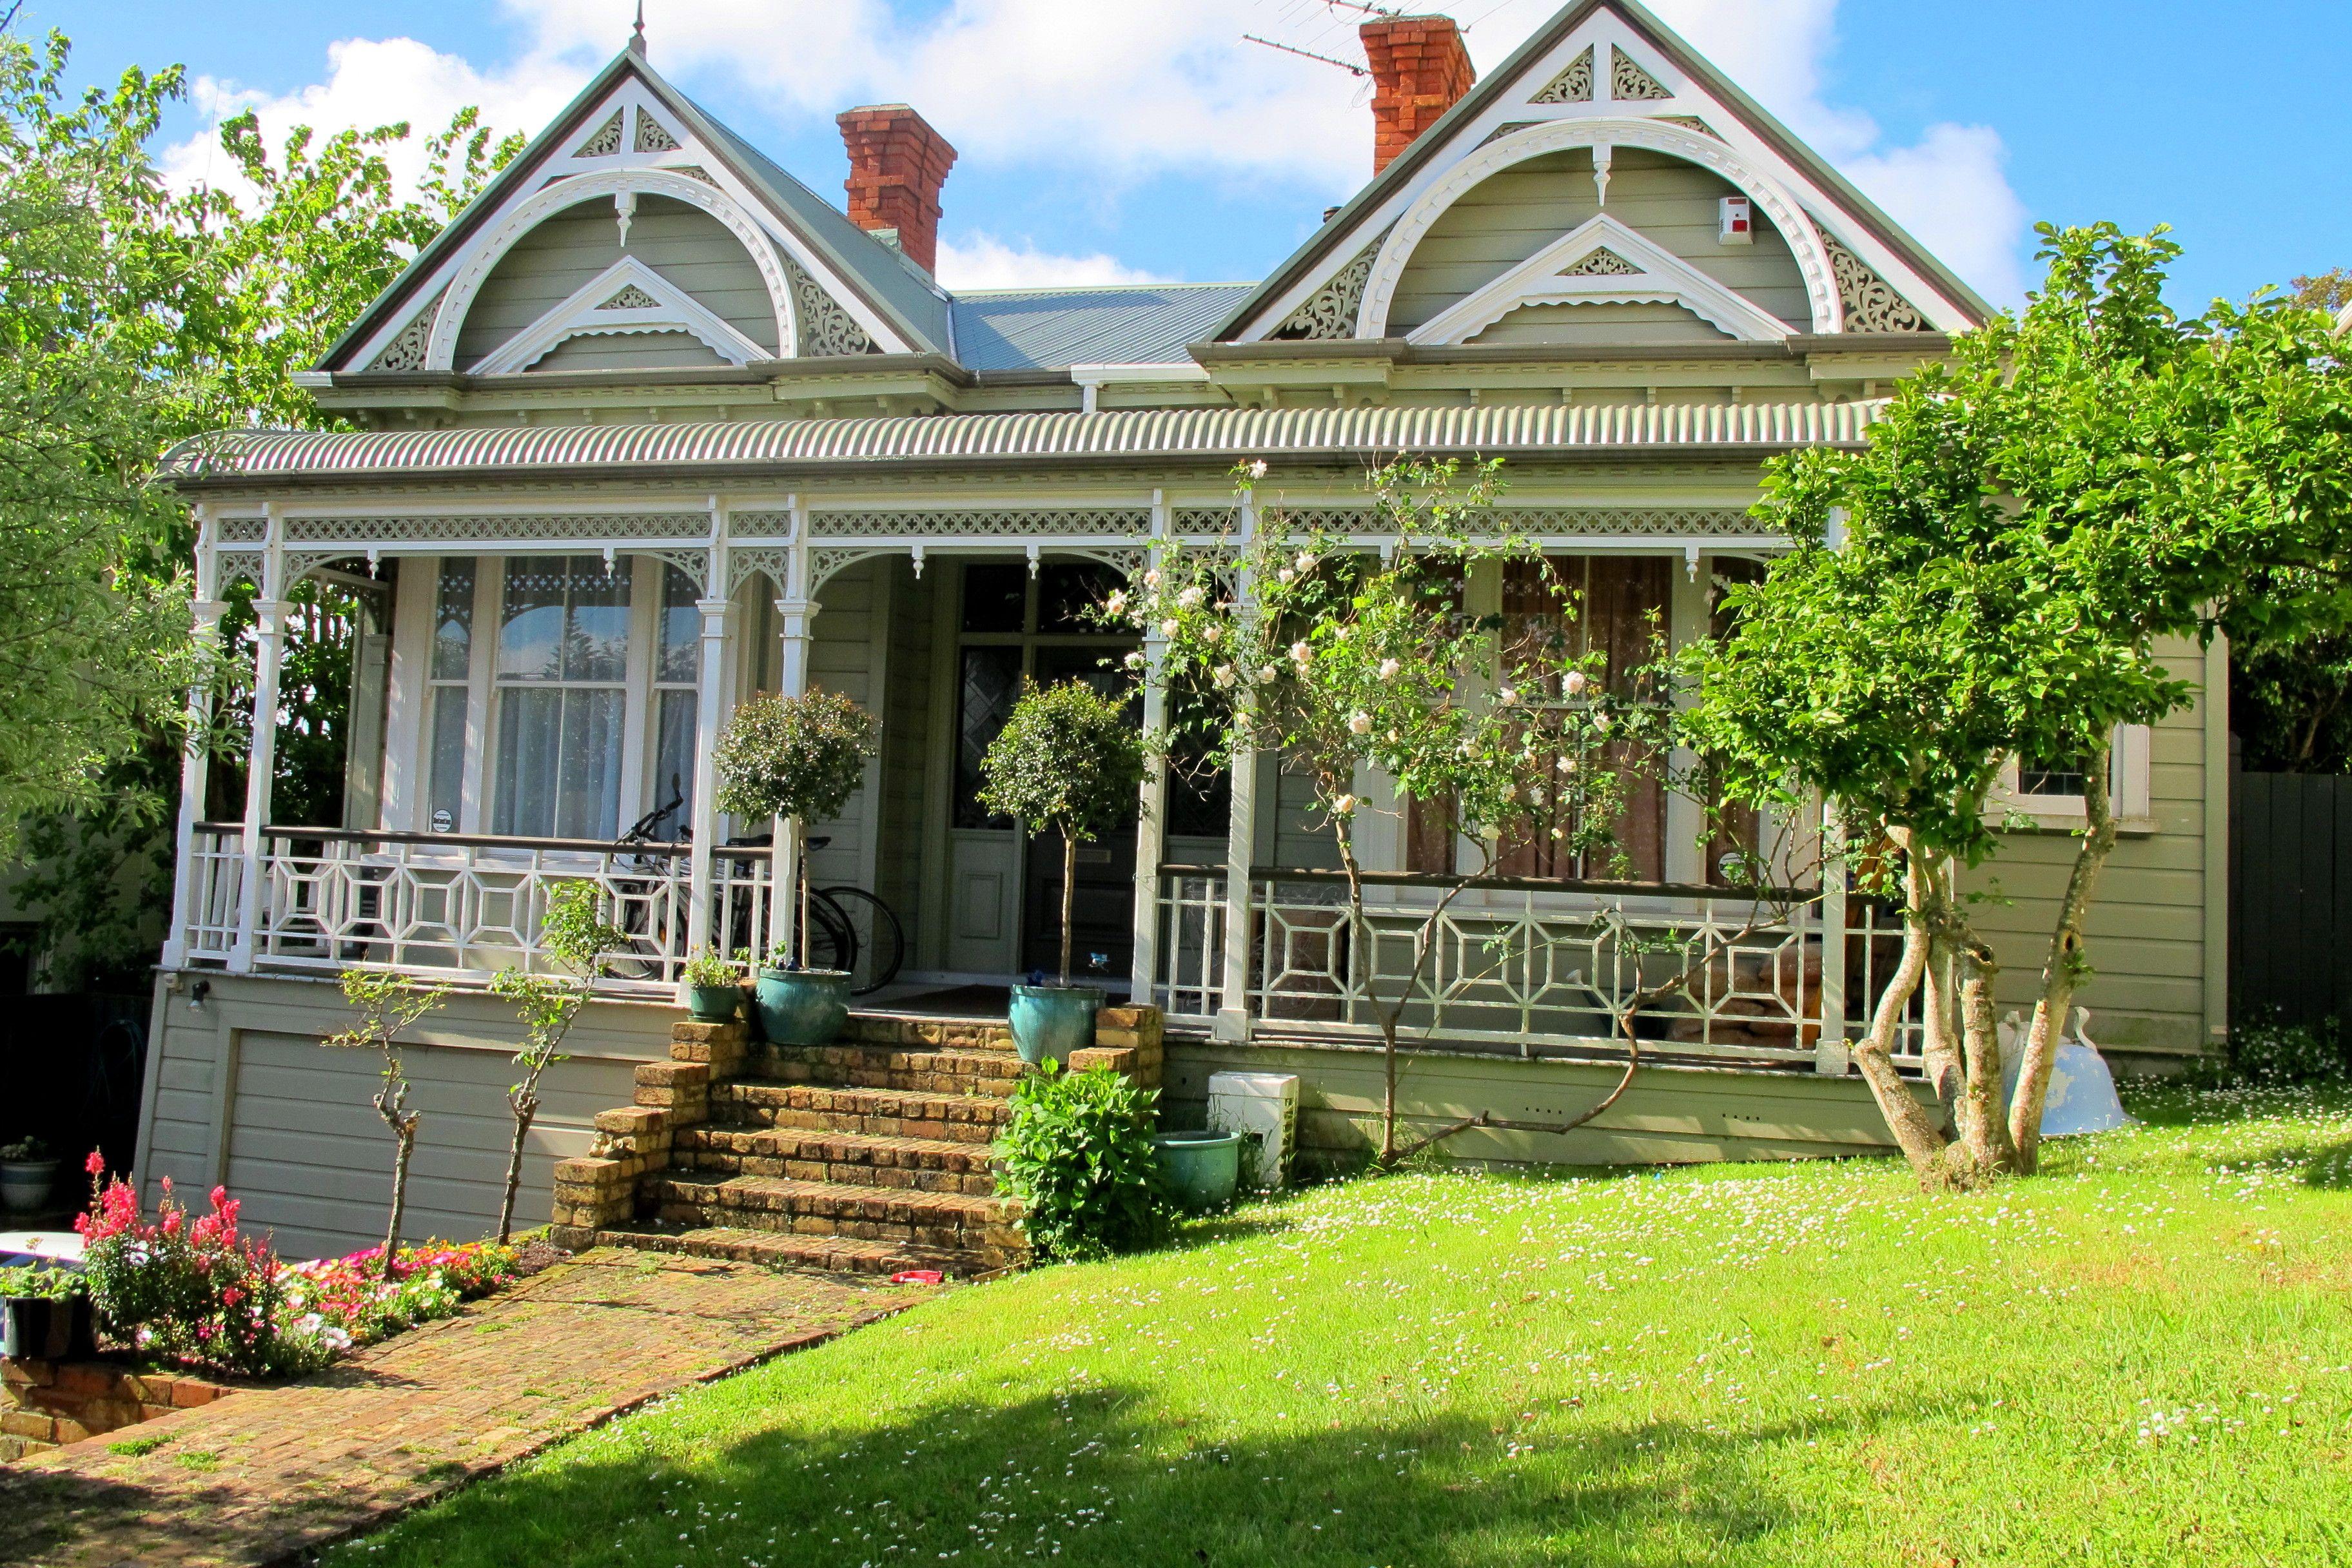 Villa, Auckland, New Zealand New zealand houses, Cottage